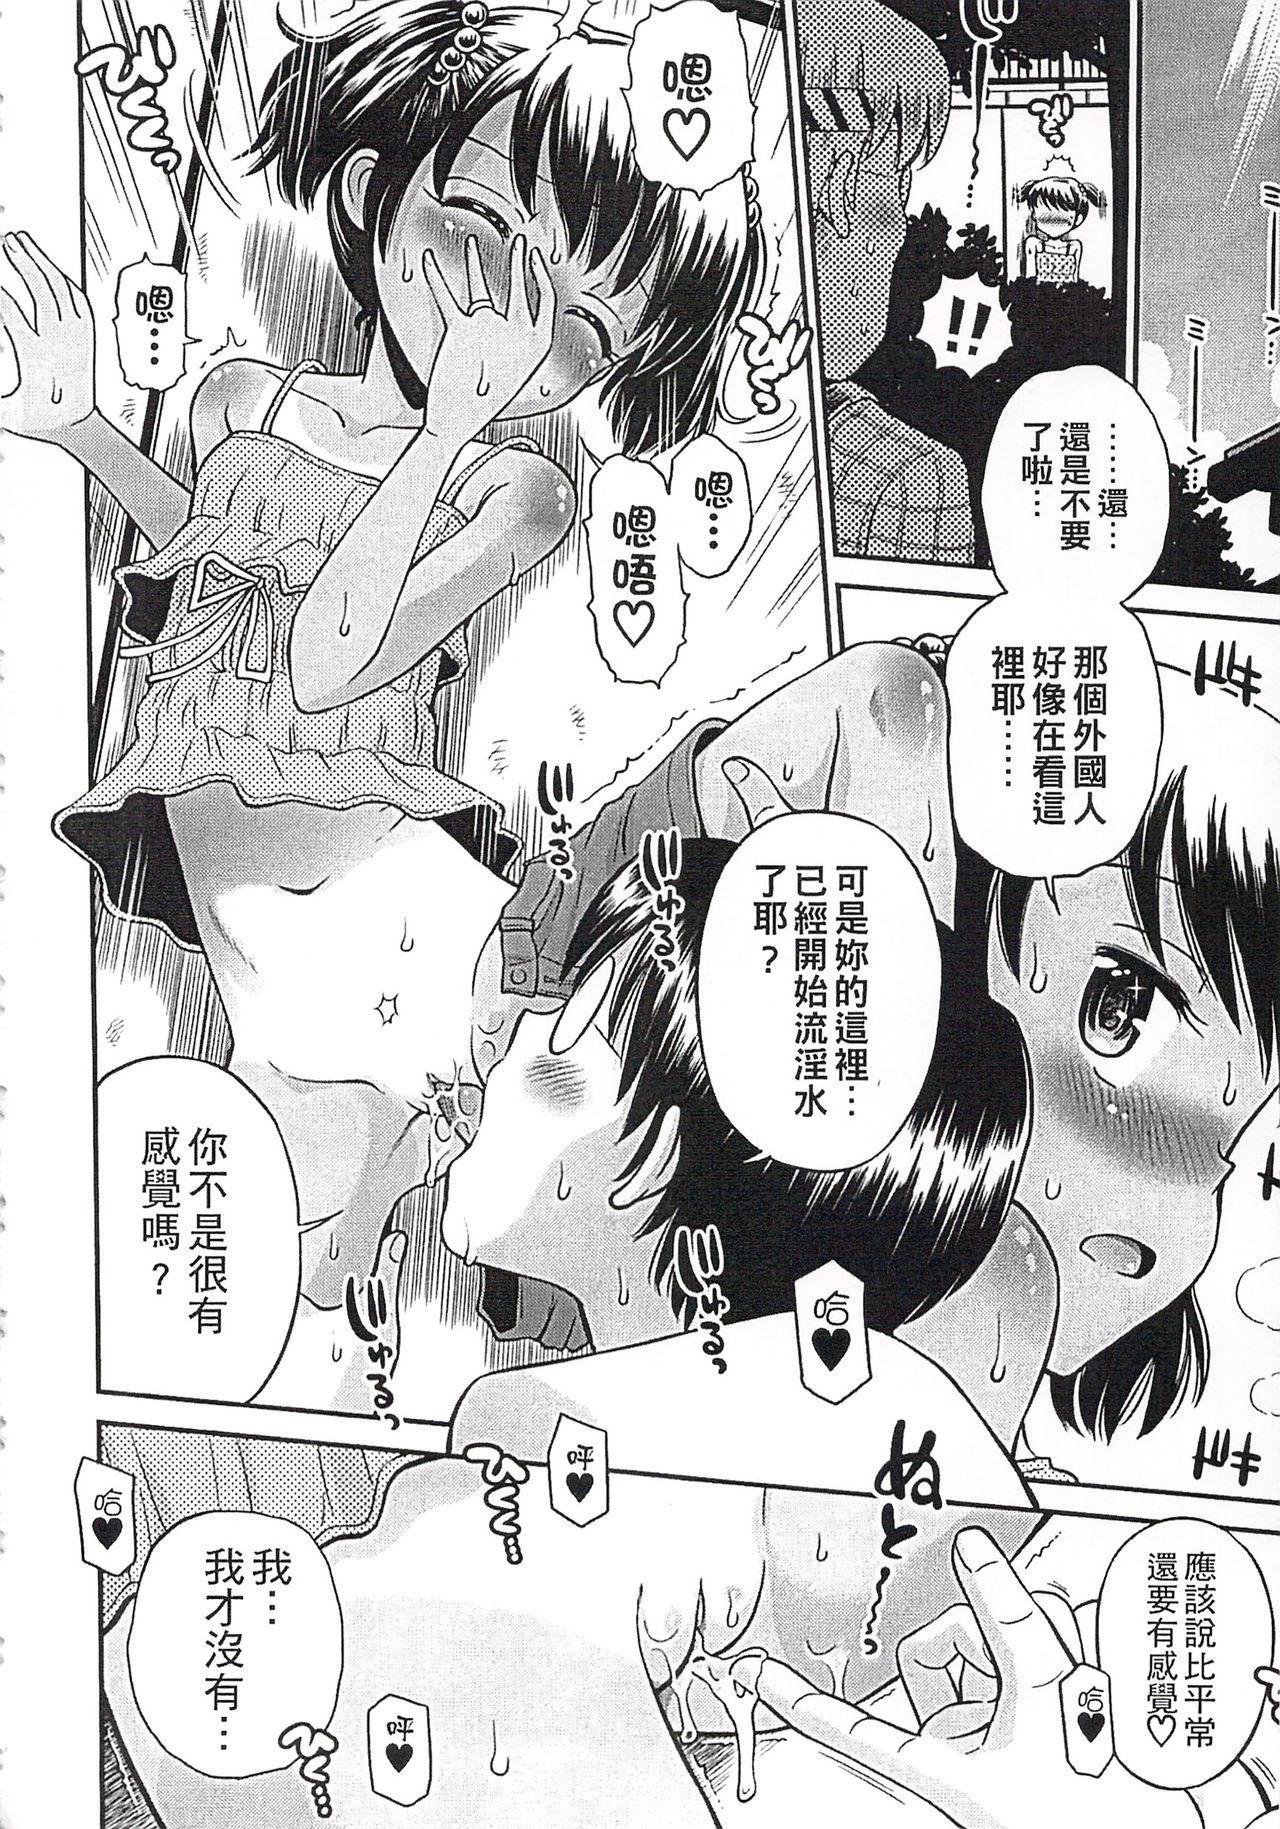 Kore demo Otona Desu Kedo!? Mrs.LOLITA Kanzenban   人家是大人啦! ~Mrs.LOLITA完全版 177